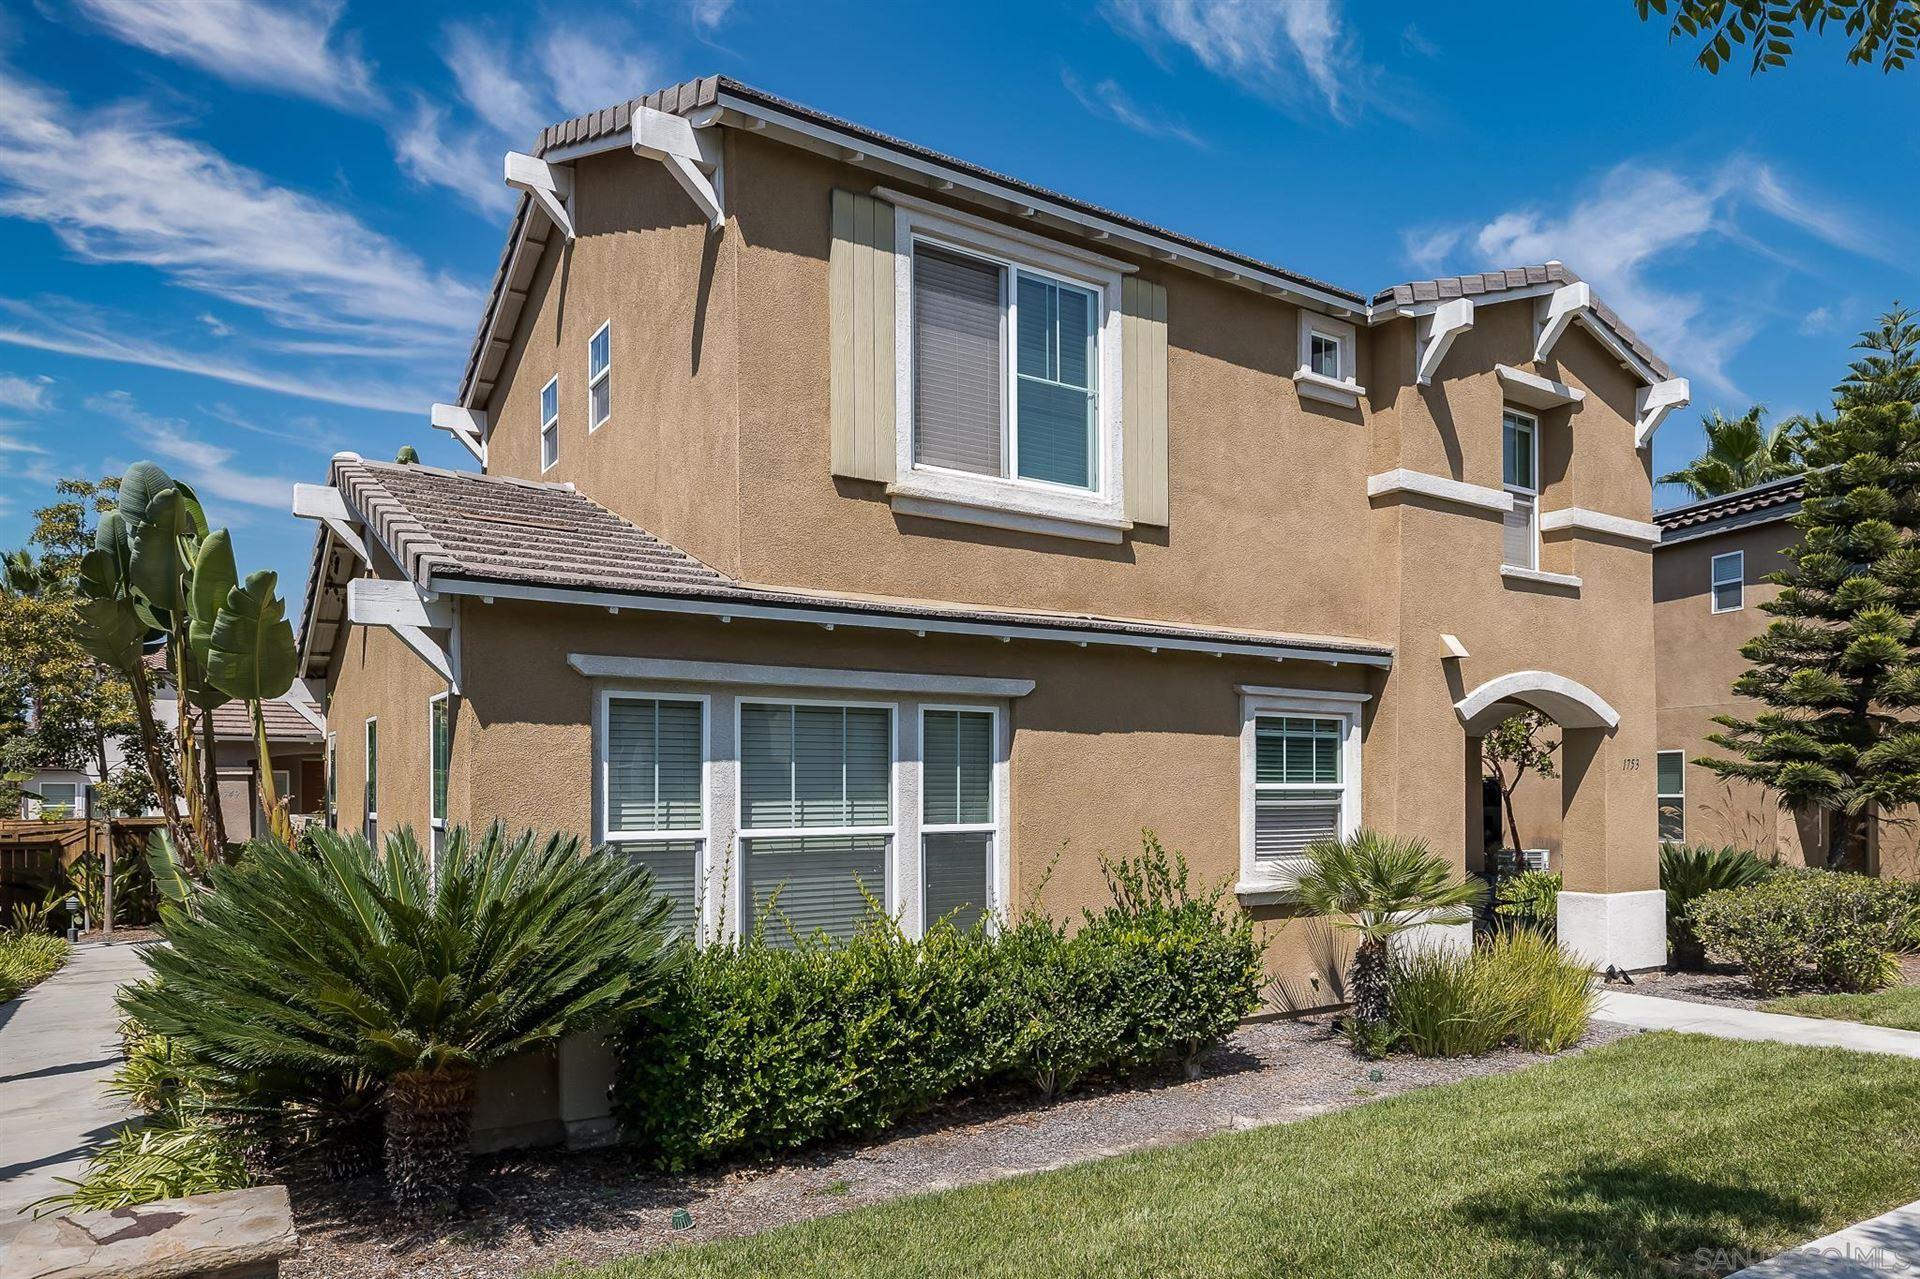 Photo of 1753 Reichert Way, Chula Vista, CA 91913 (MLS # 210026358)